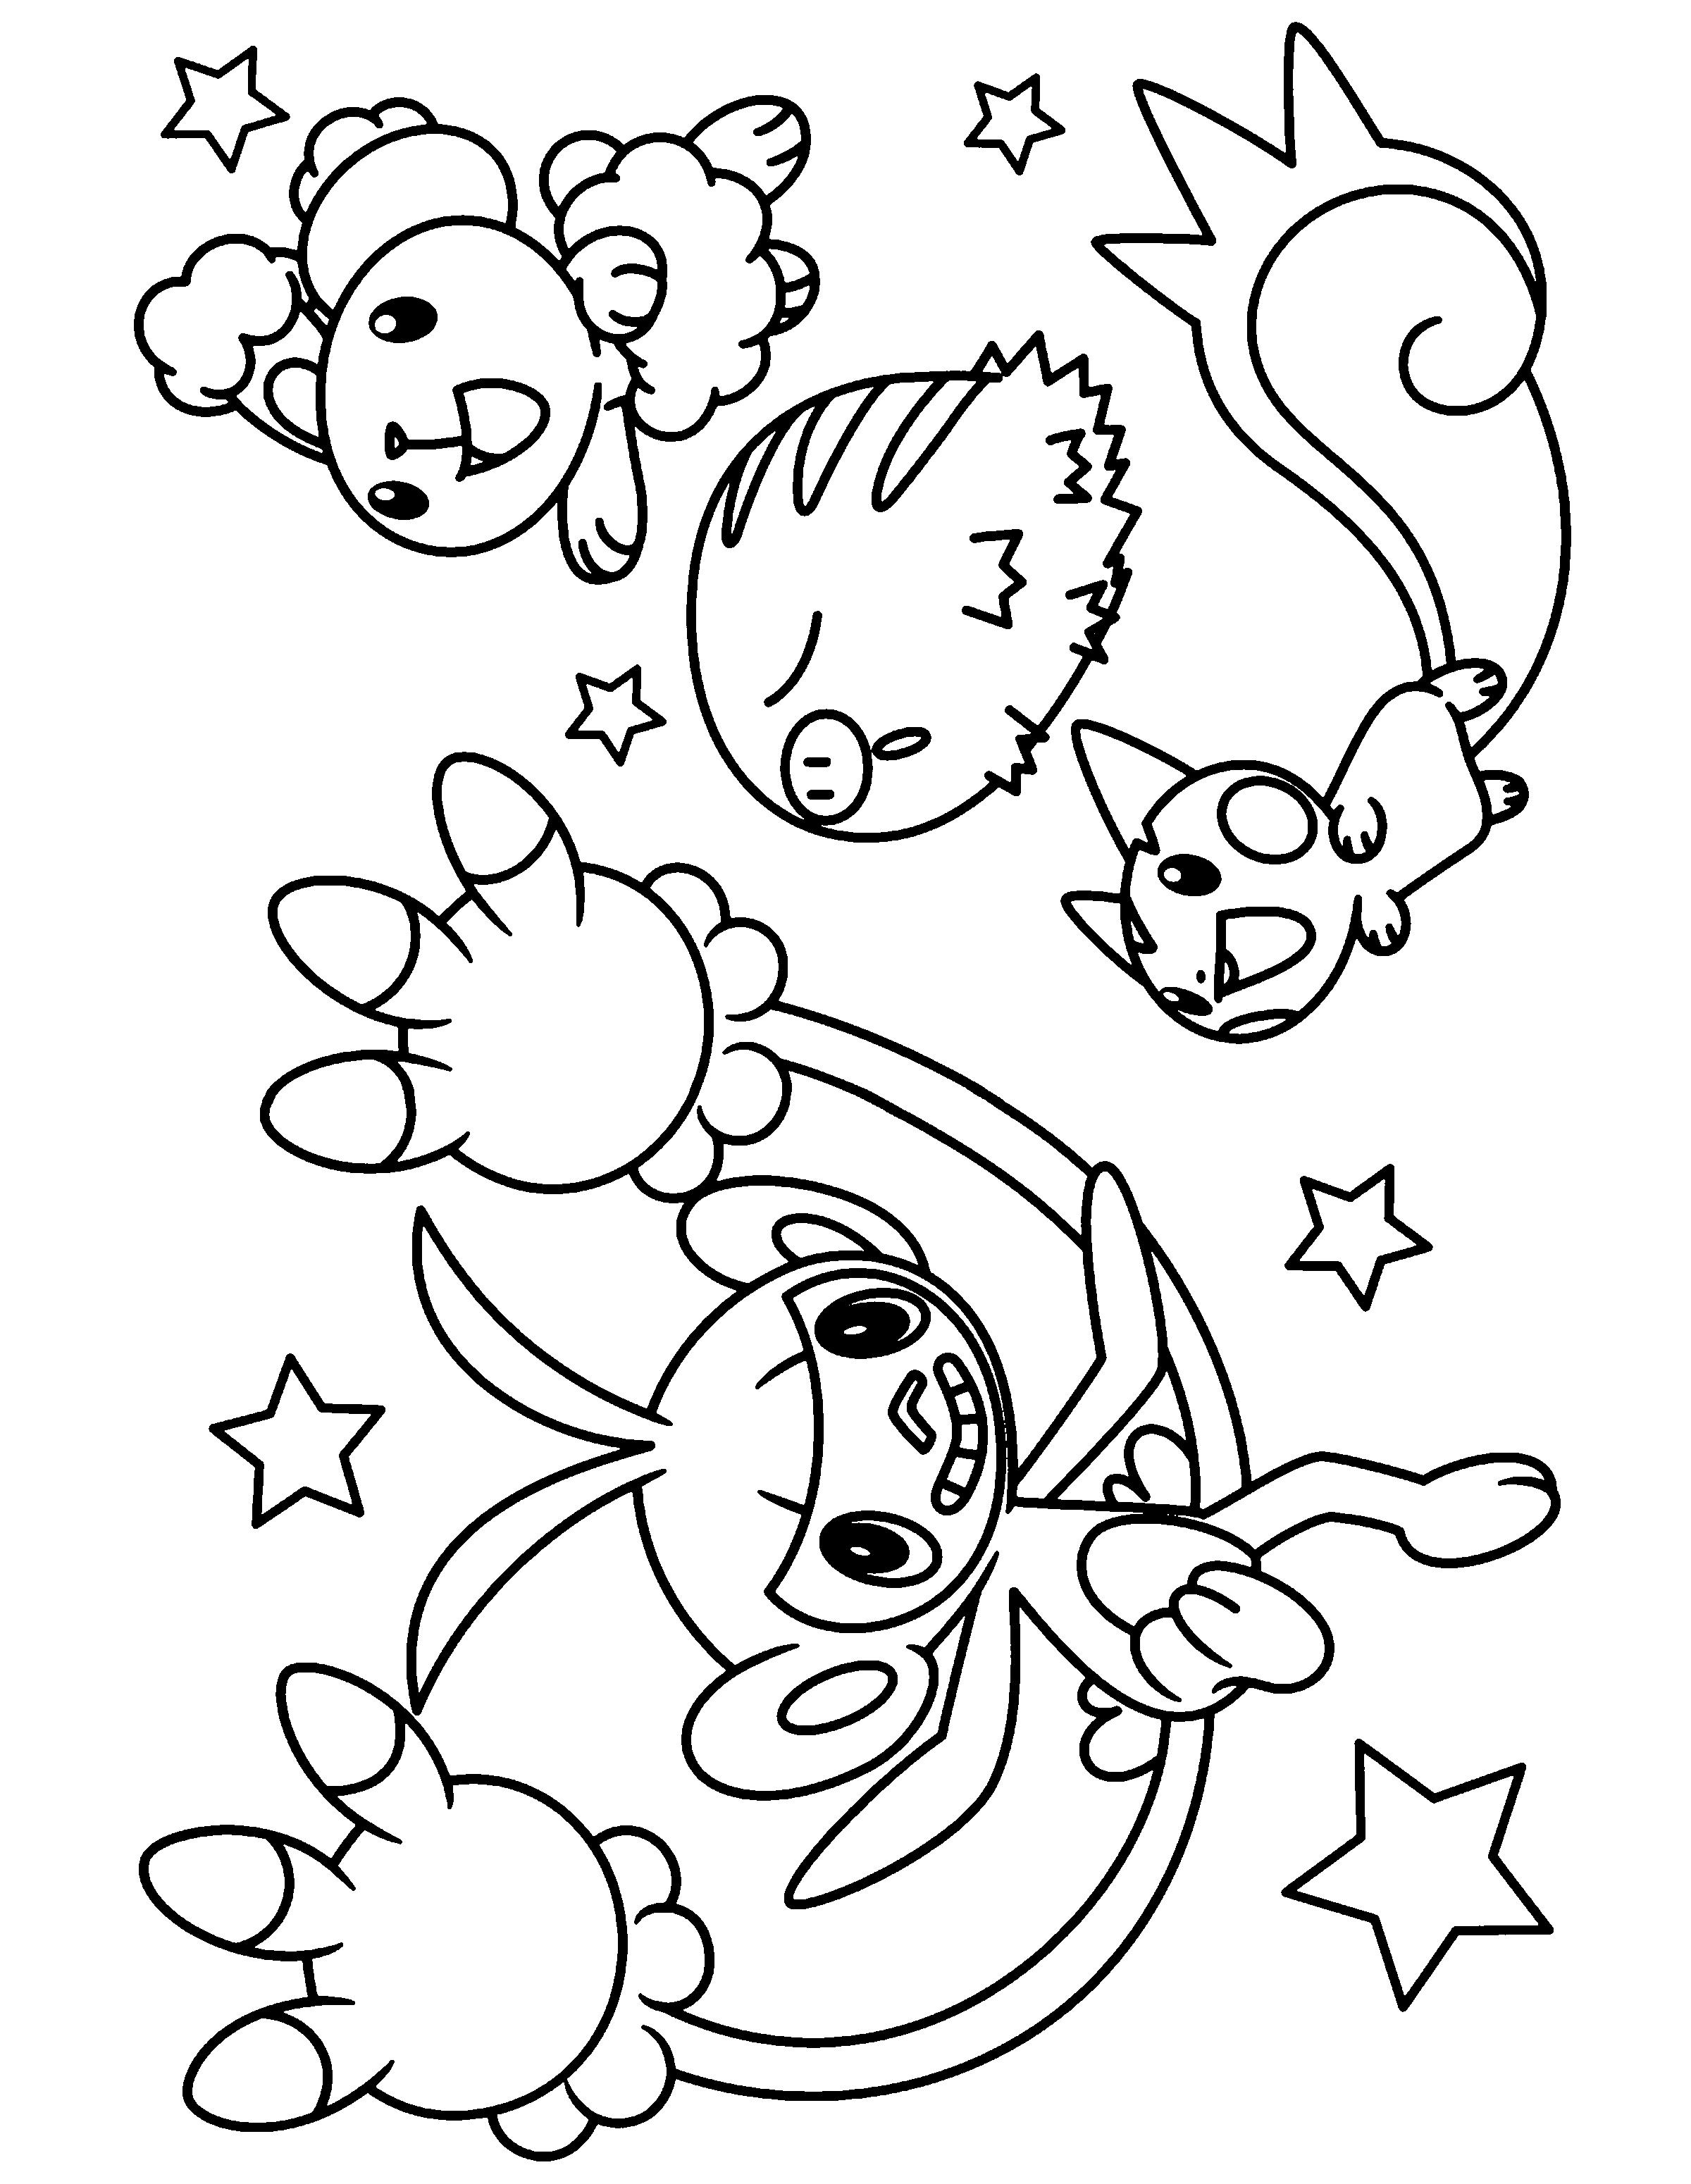 Pokemon diamond pearl ausmalbilder